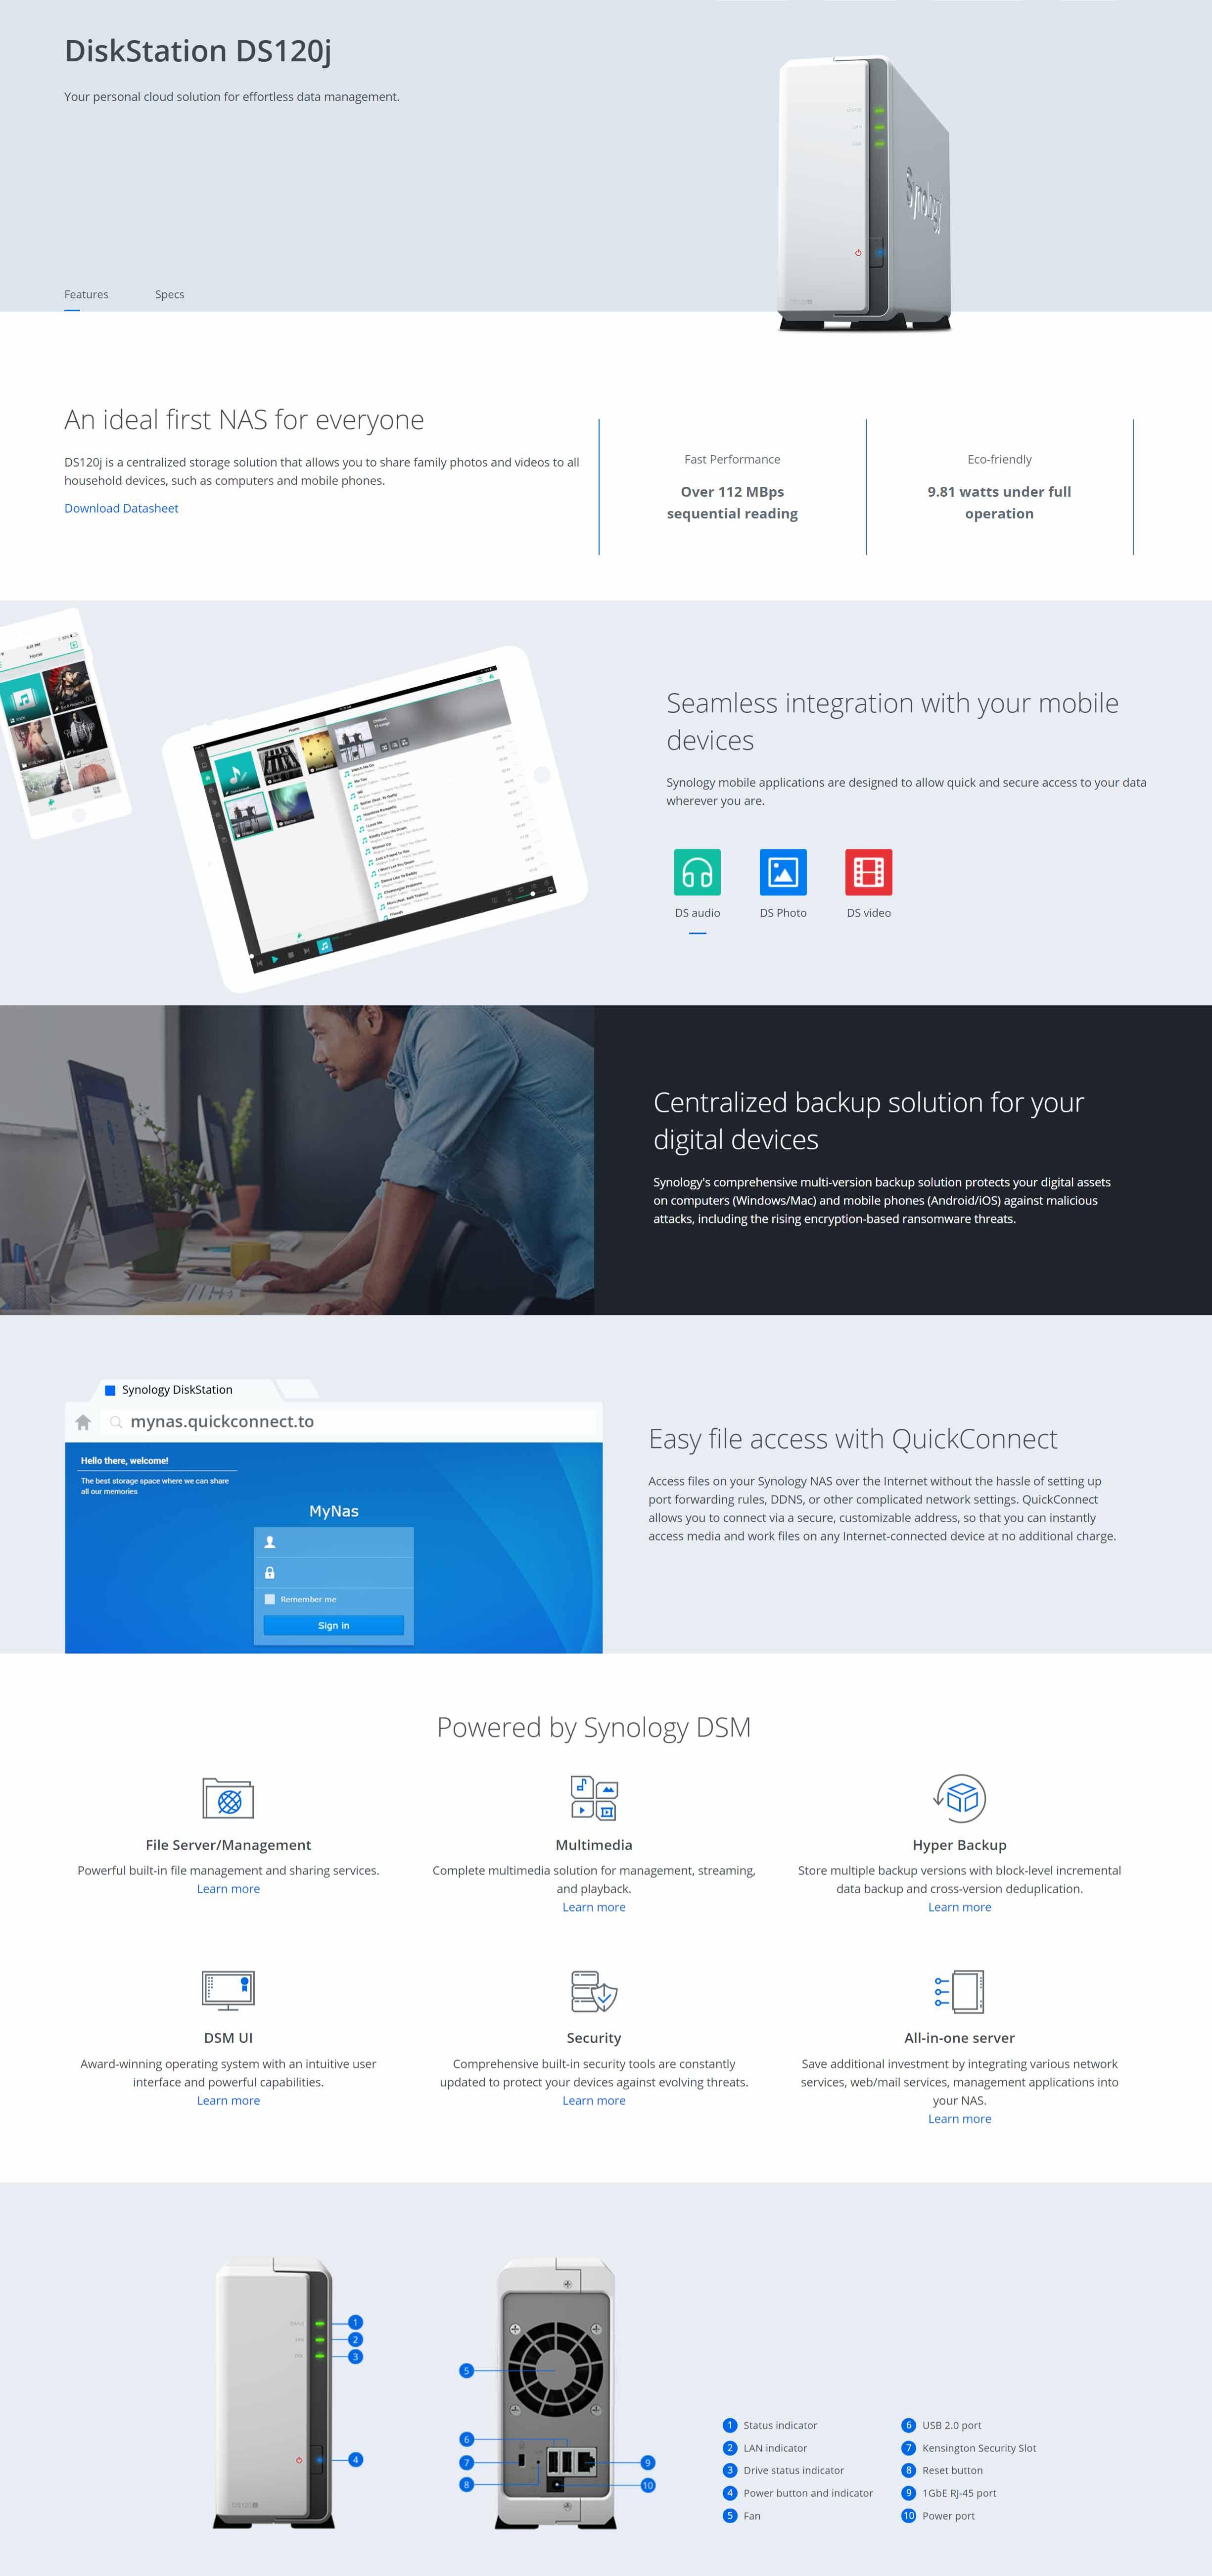 screencapture-synology-en-global-products-DS120j-2020-01-07-13_45_58.jpg